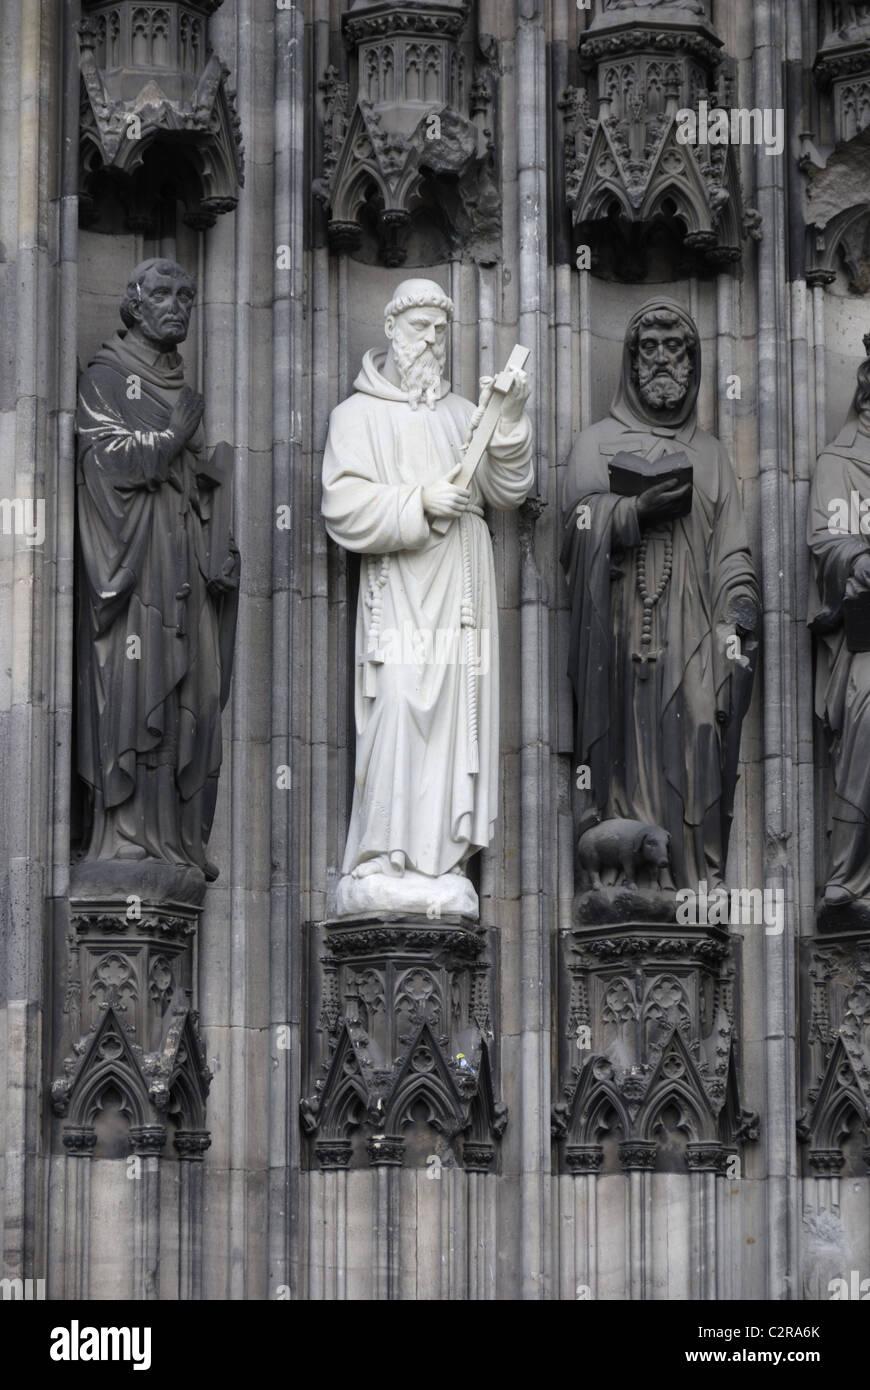 Heiligenfiguren am Kölner Dom Stockbild